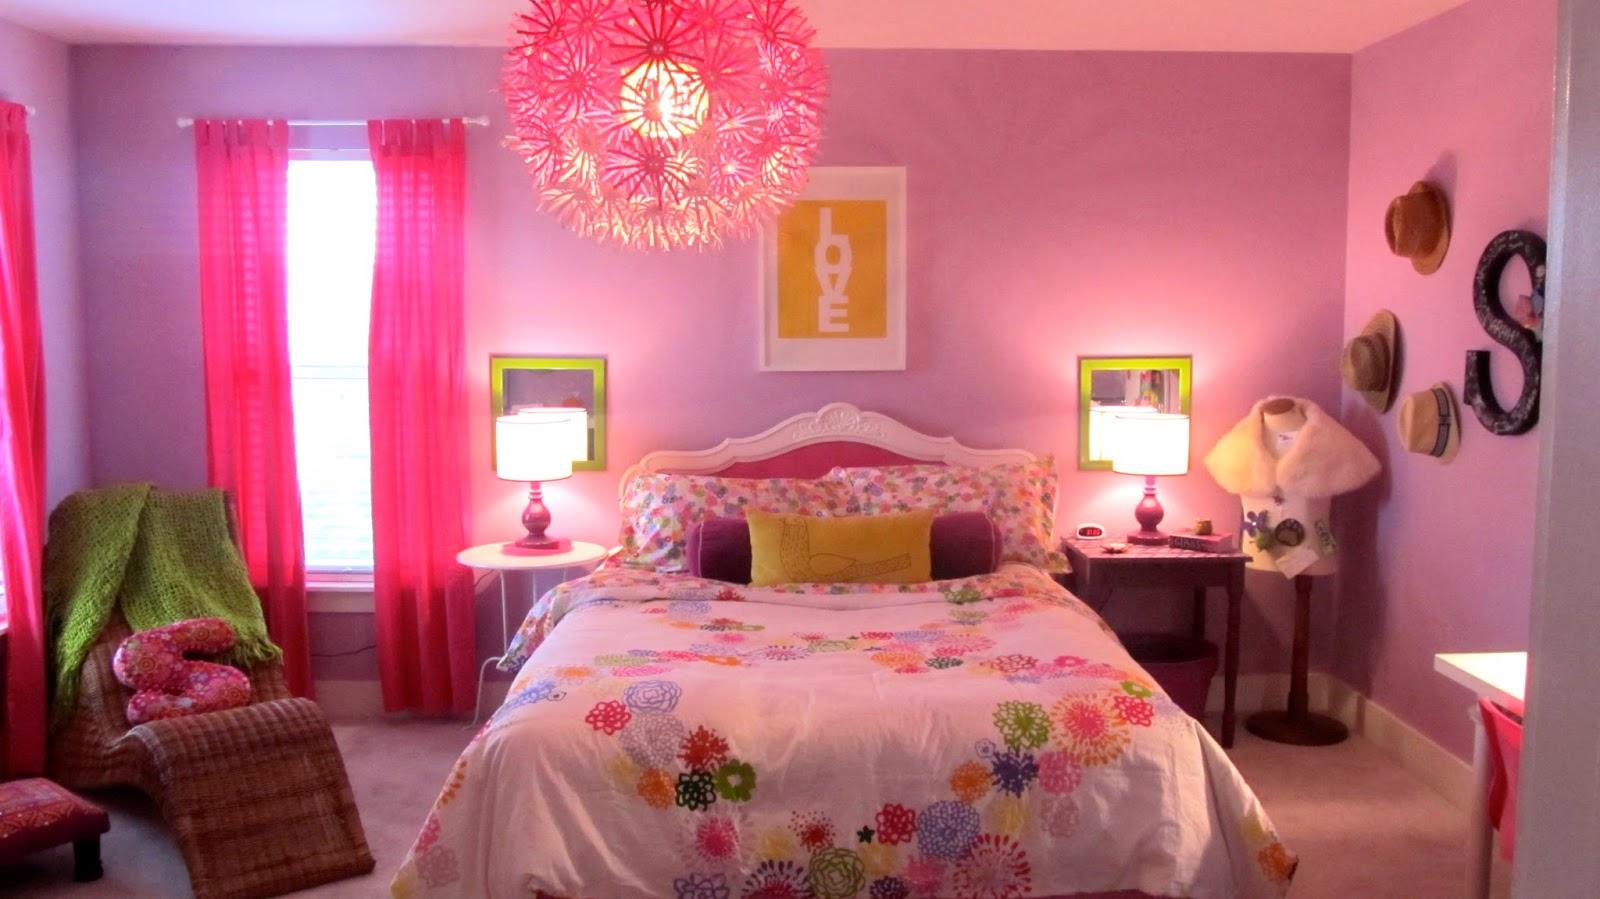 related post with lighting 7 lighting black interior bedroom bedroom bedroom beautiful furniture cute pink